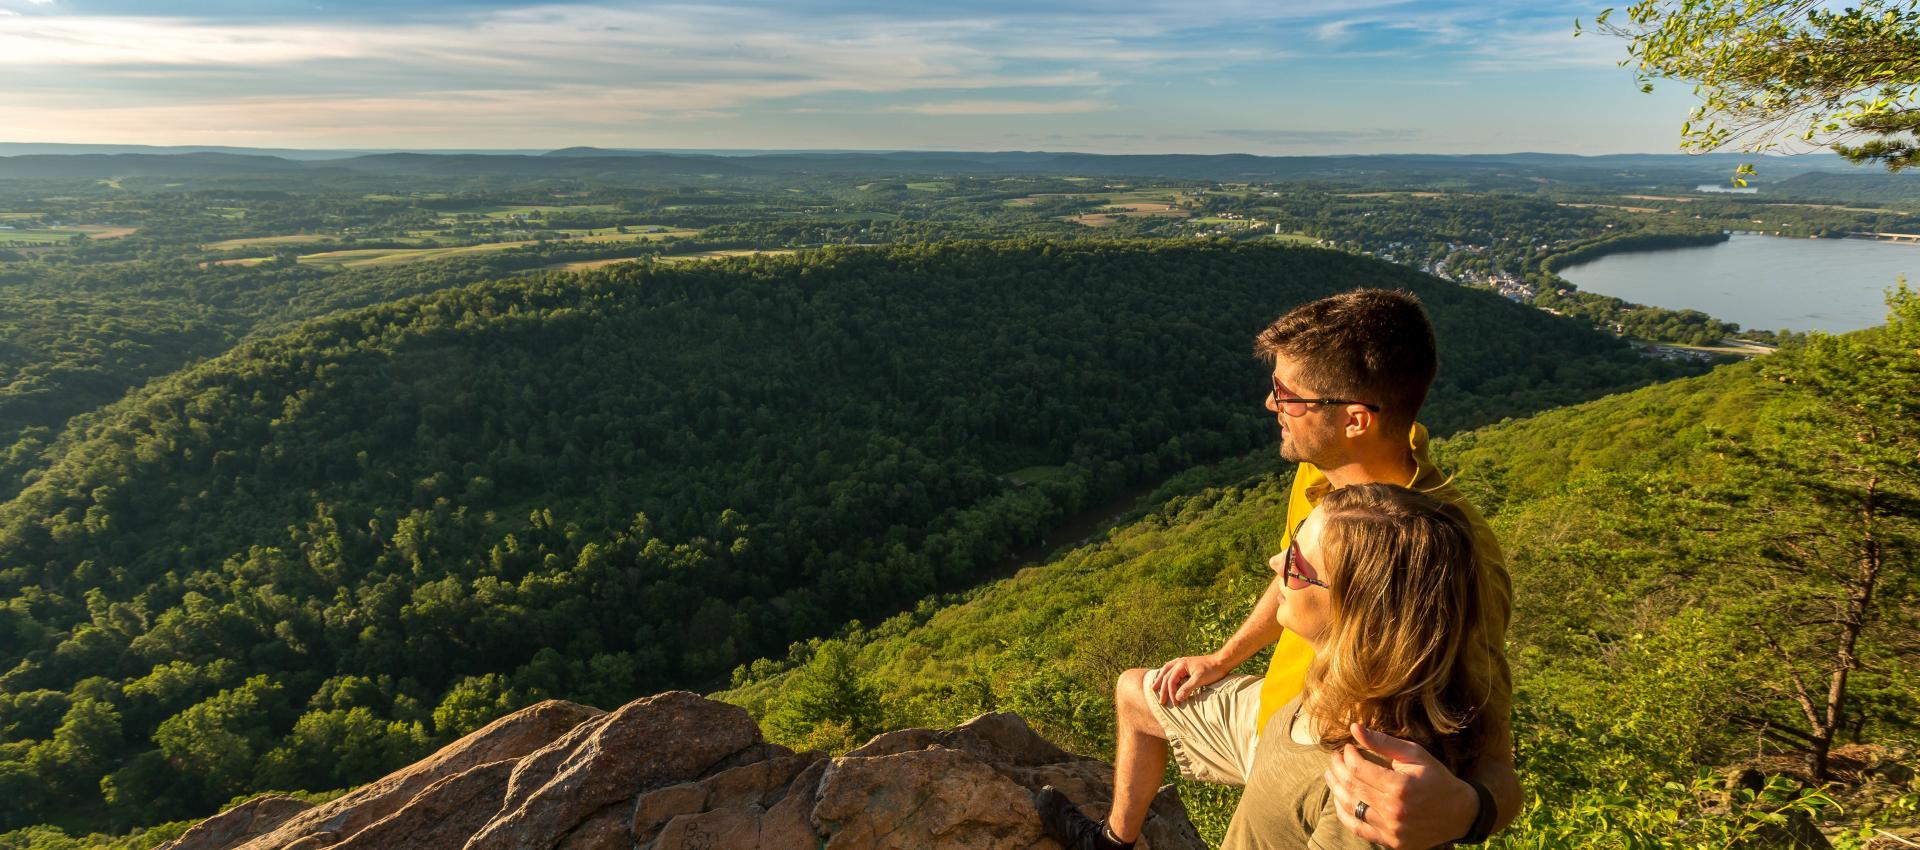 appalachian-trail-hiking-hawk-rock-peters-mountain